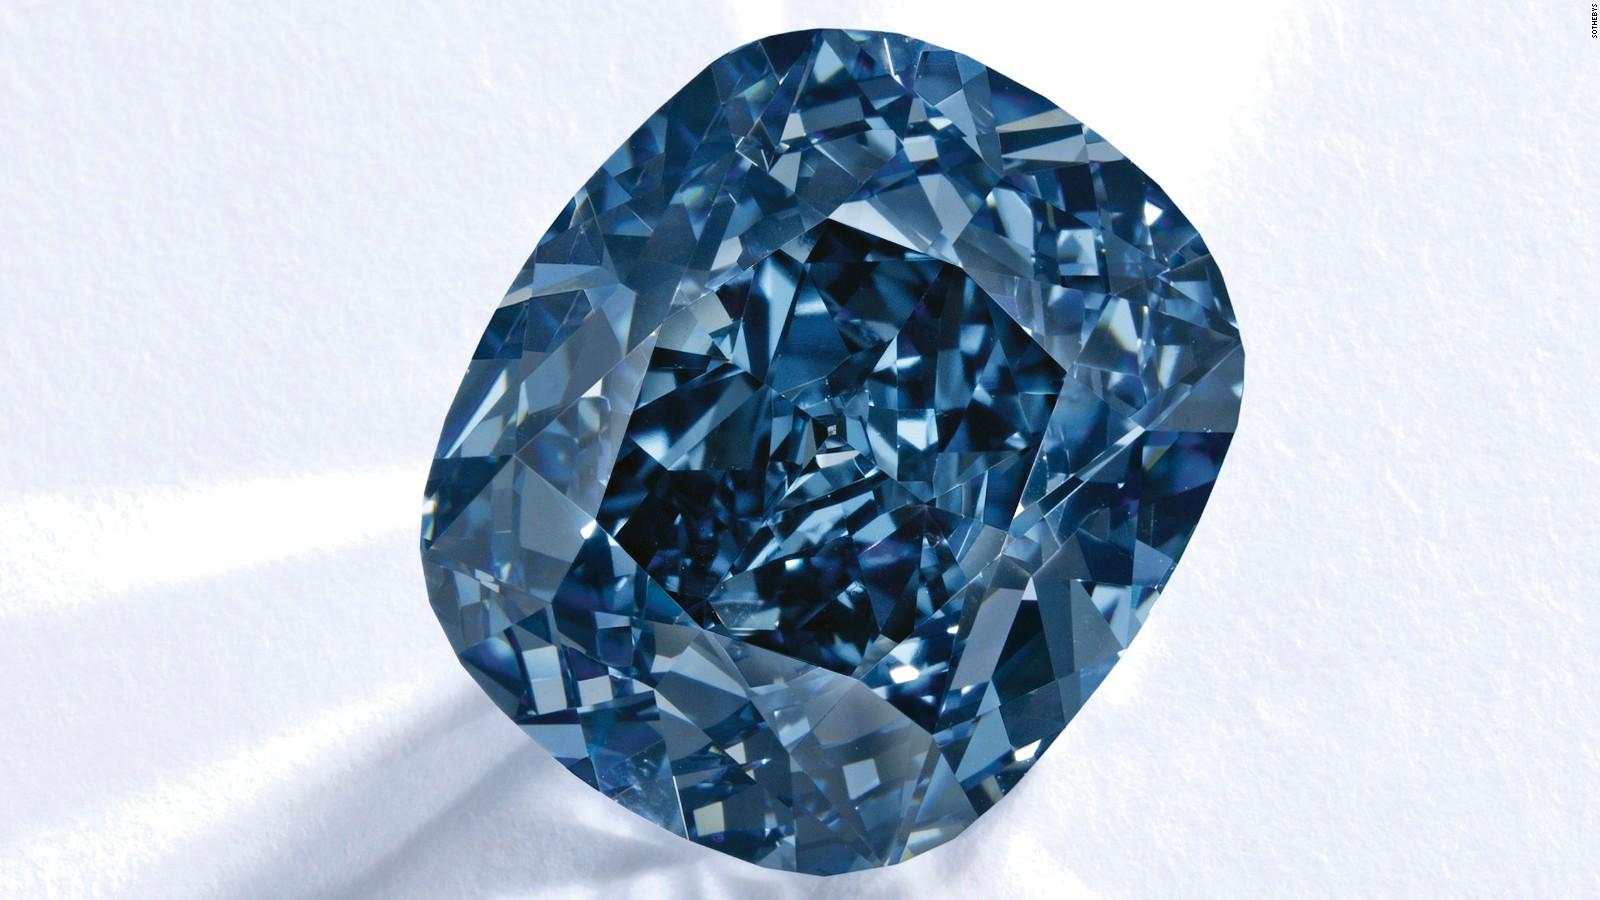 151112110952-blue-moon-diamond-8-full-169